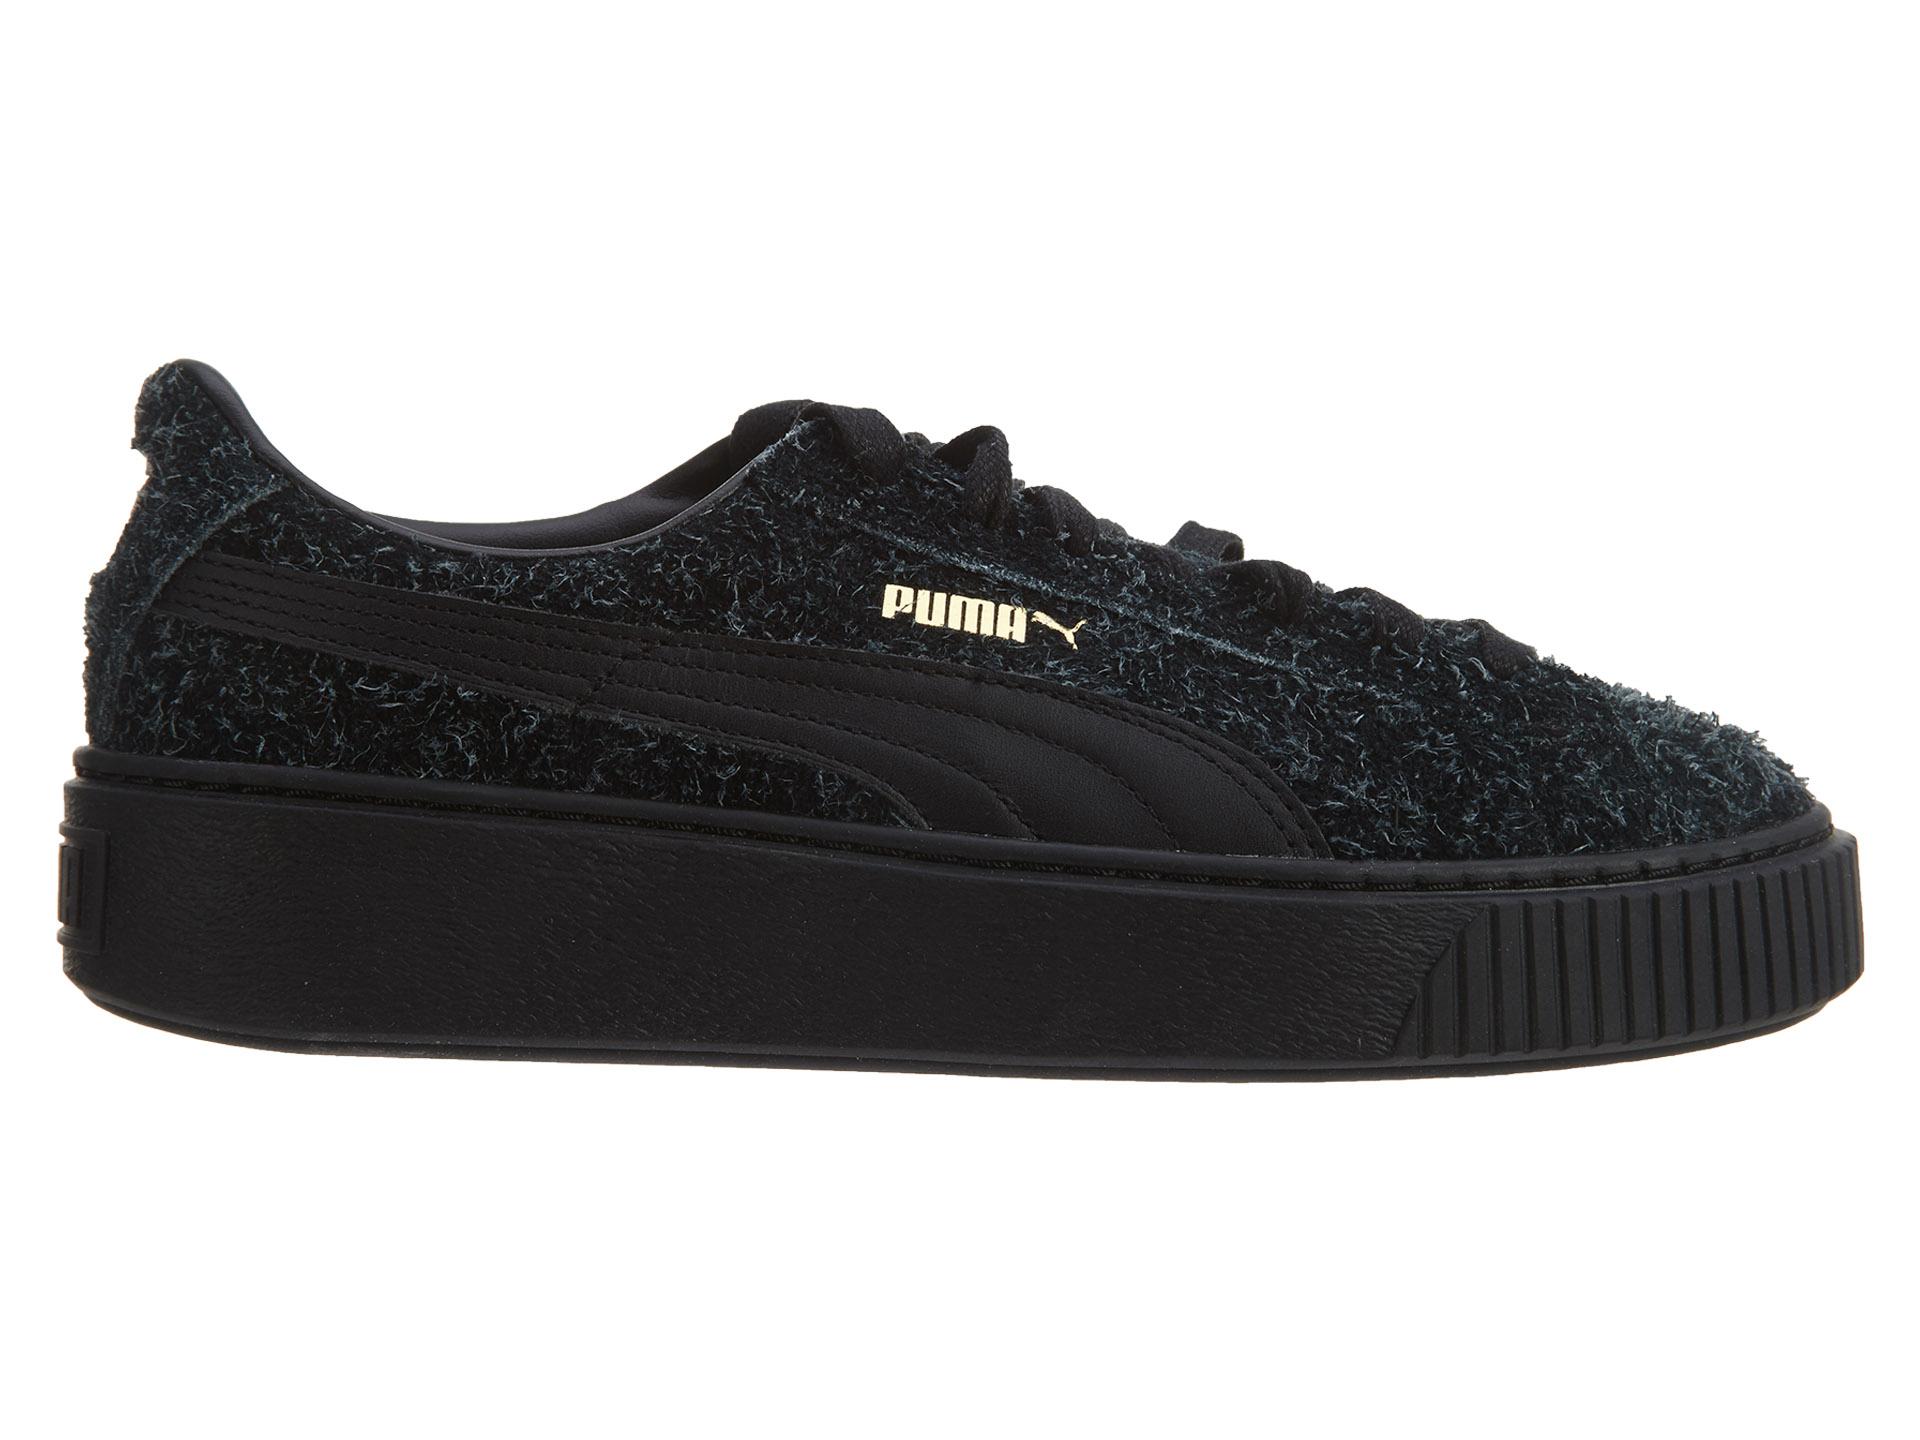 PUMA Suede Platform Elemental Collection Sneaker Freaker